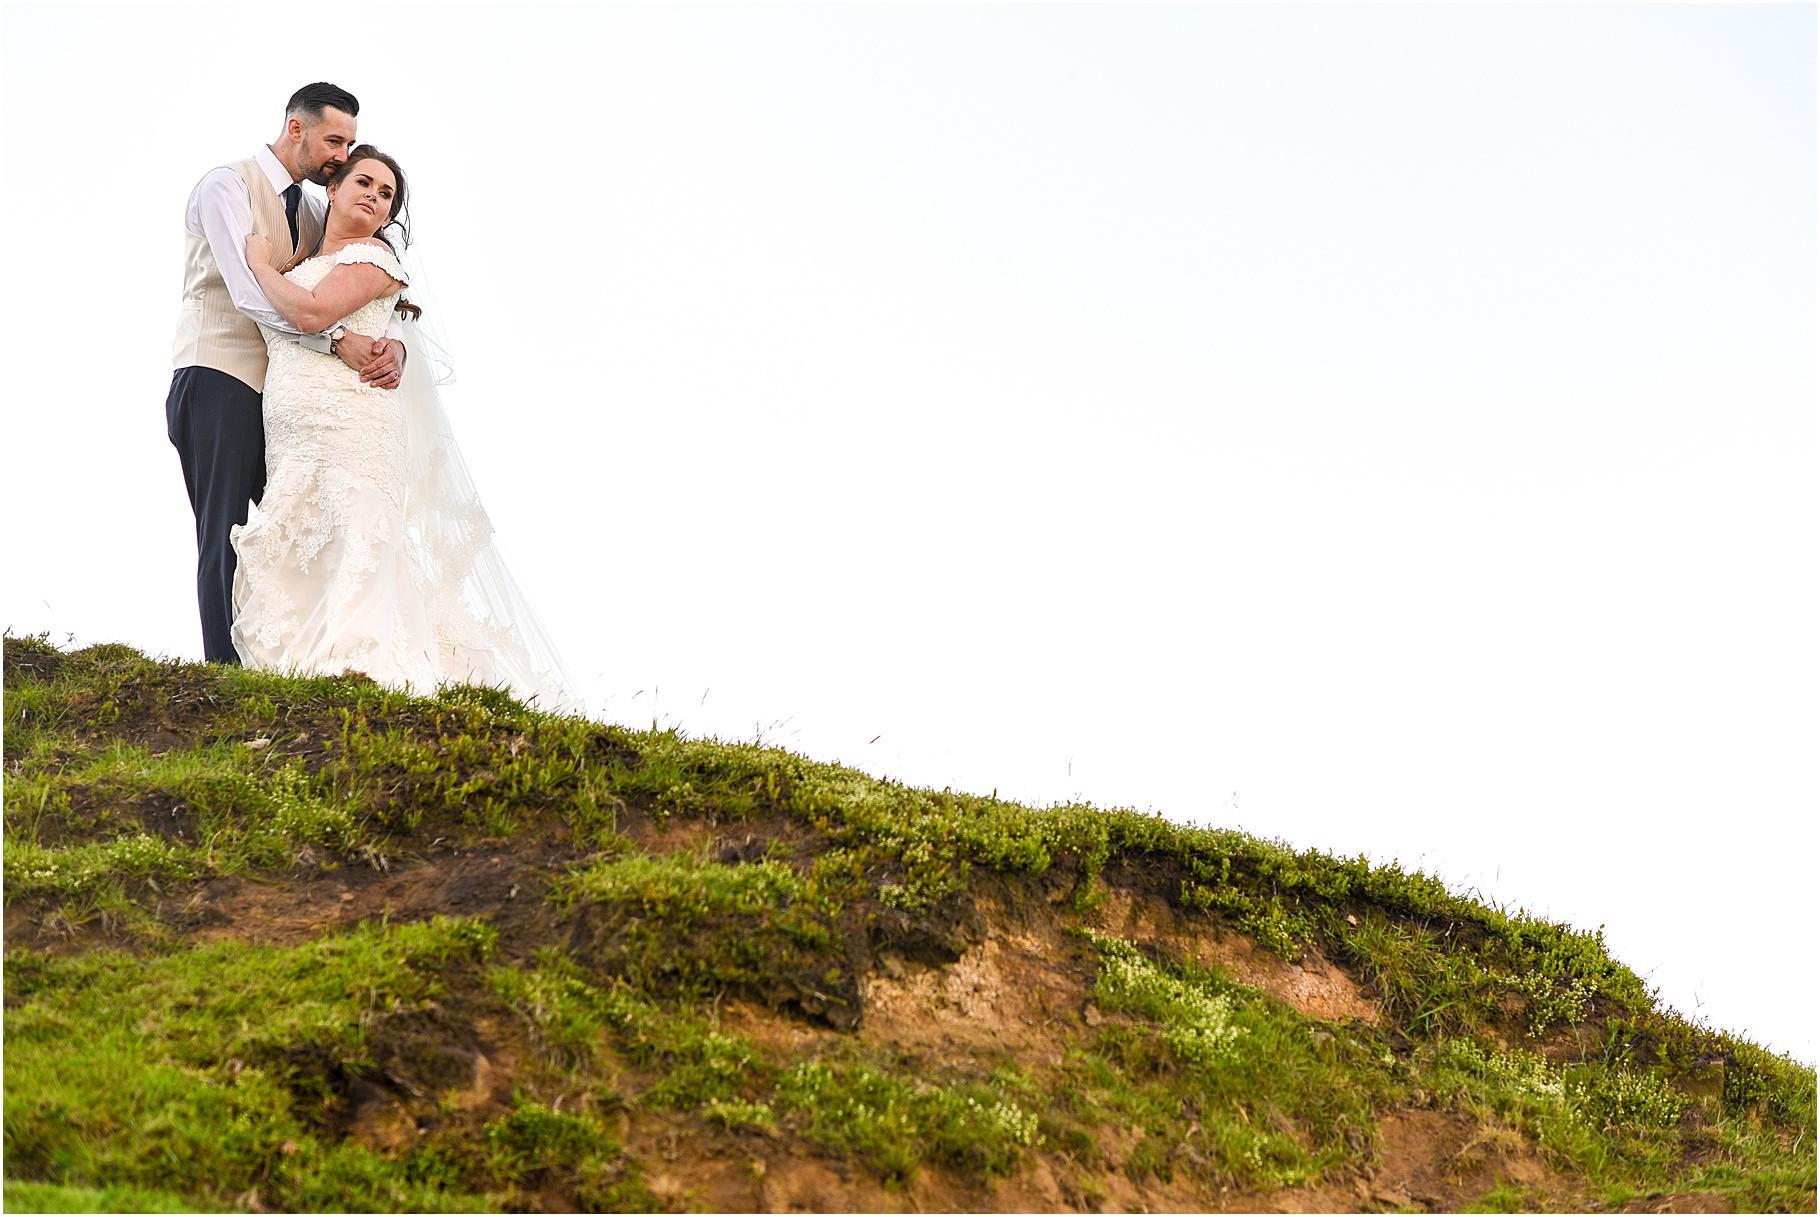 marquee-wedding-photography-111.jpg